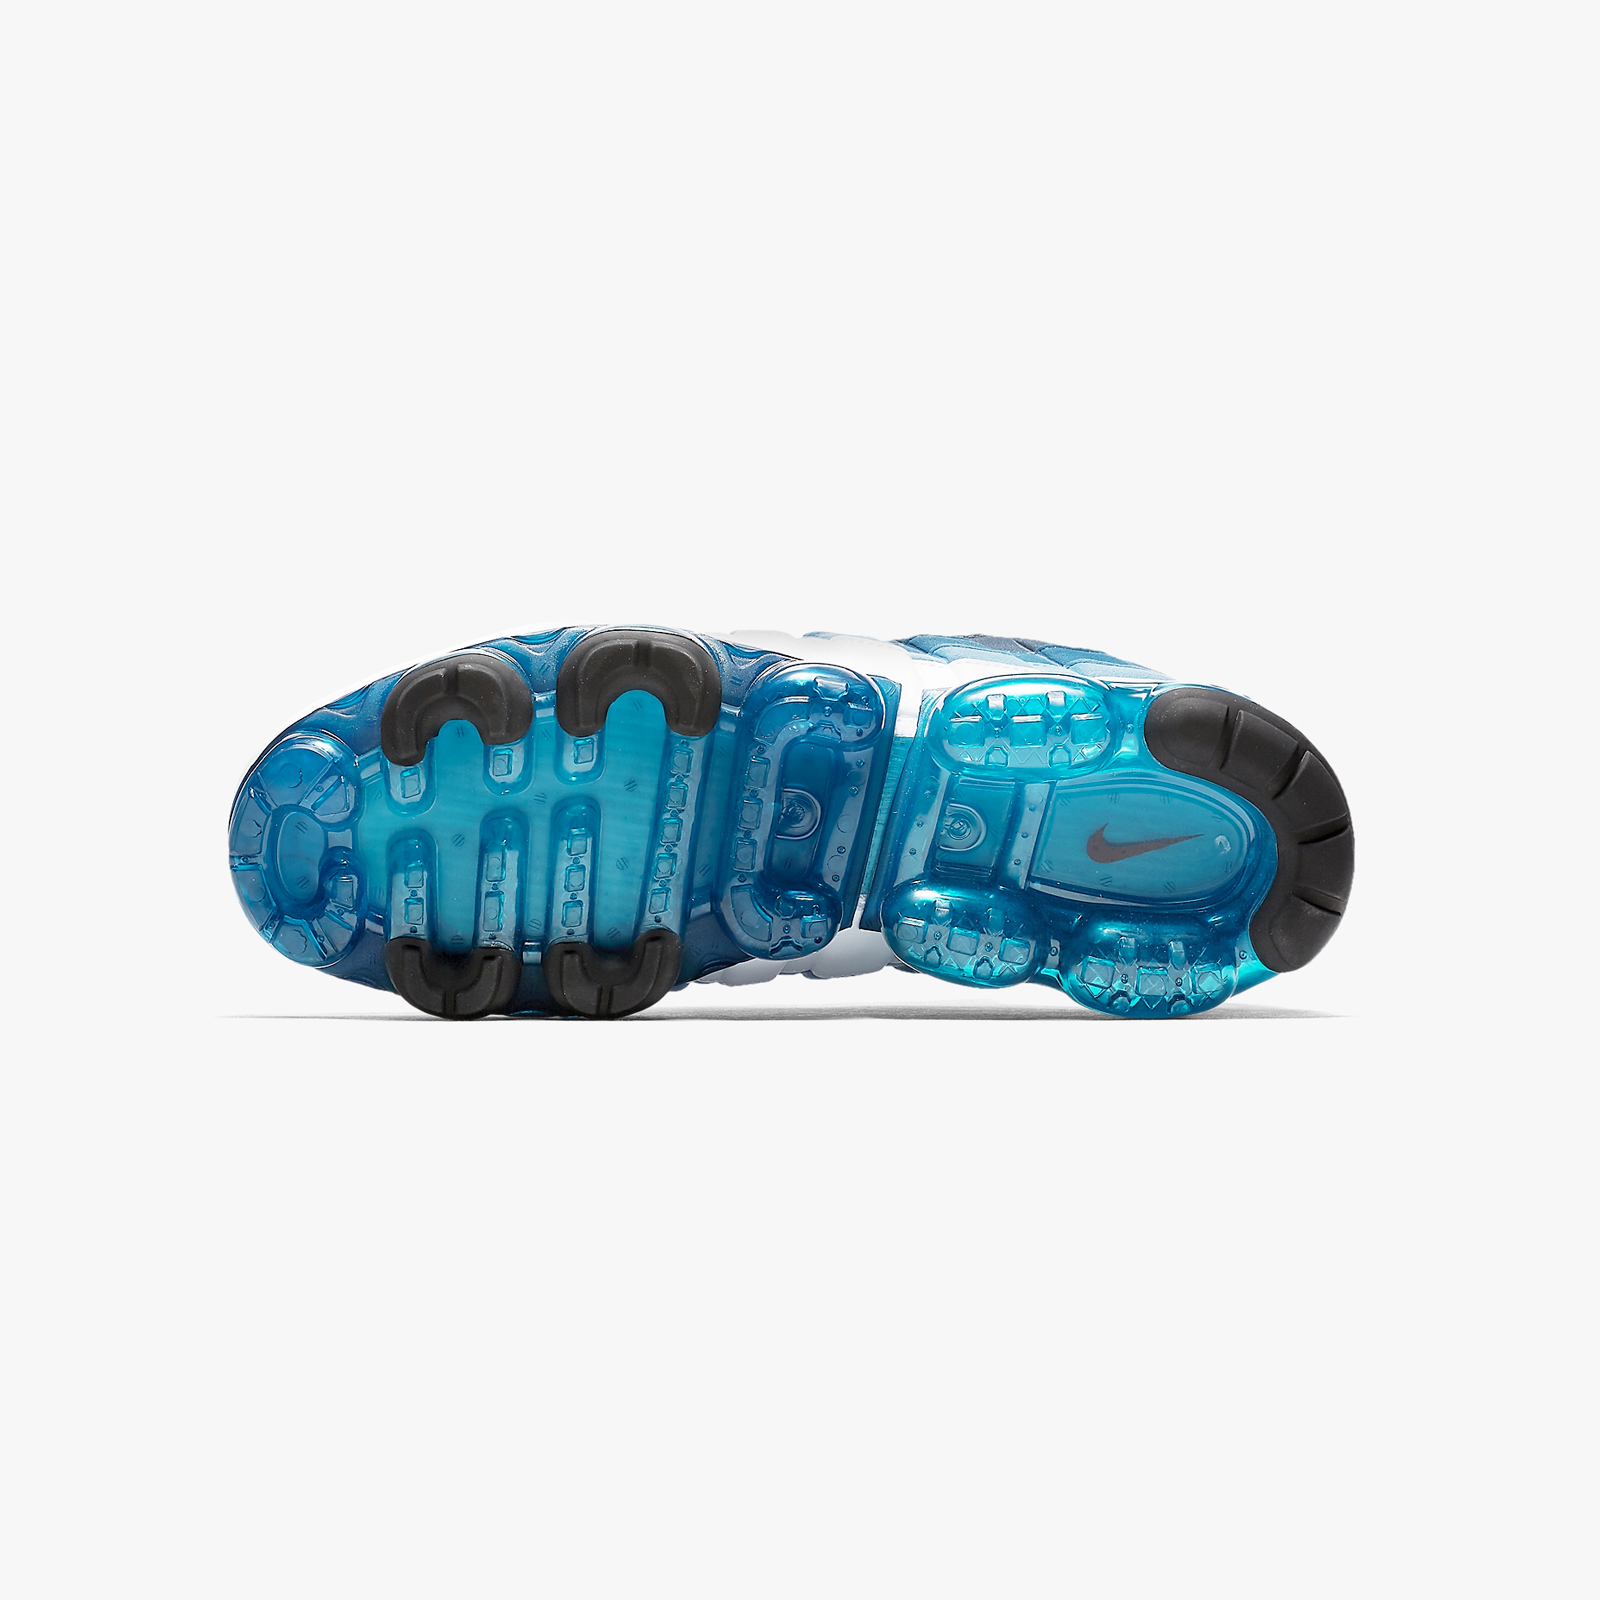 f83f1a55061e Nike Air Vapormax 95 - Aj7292-100 - Sneakersnstuff